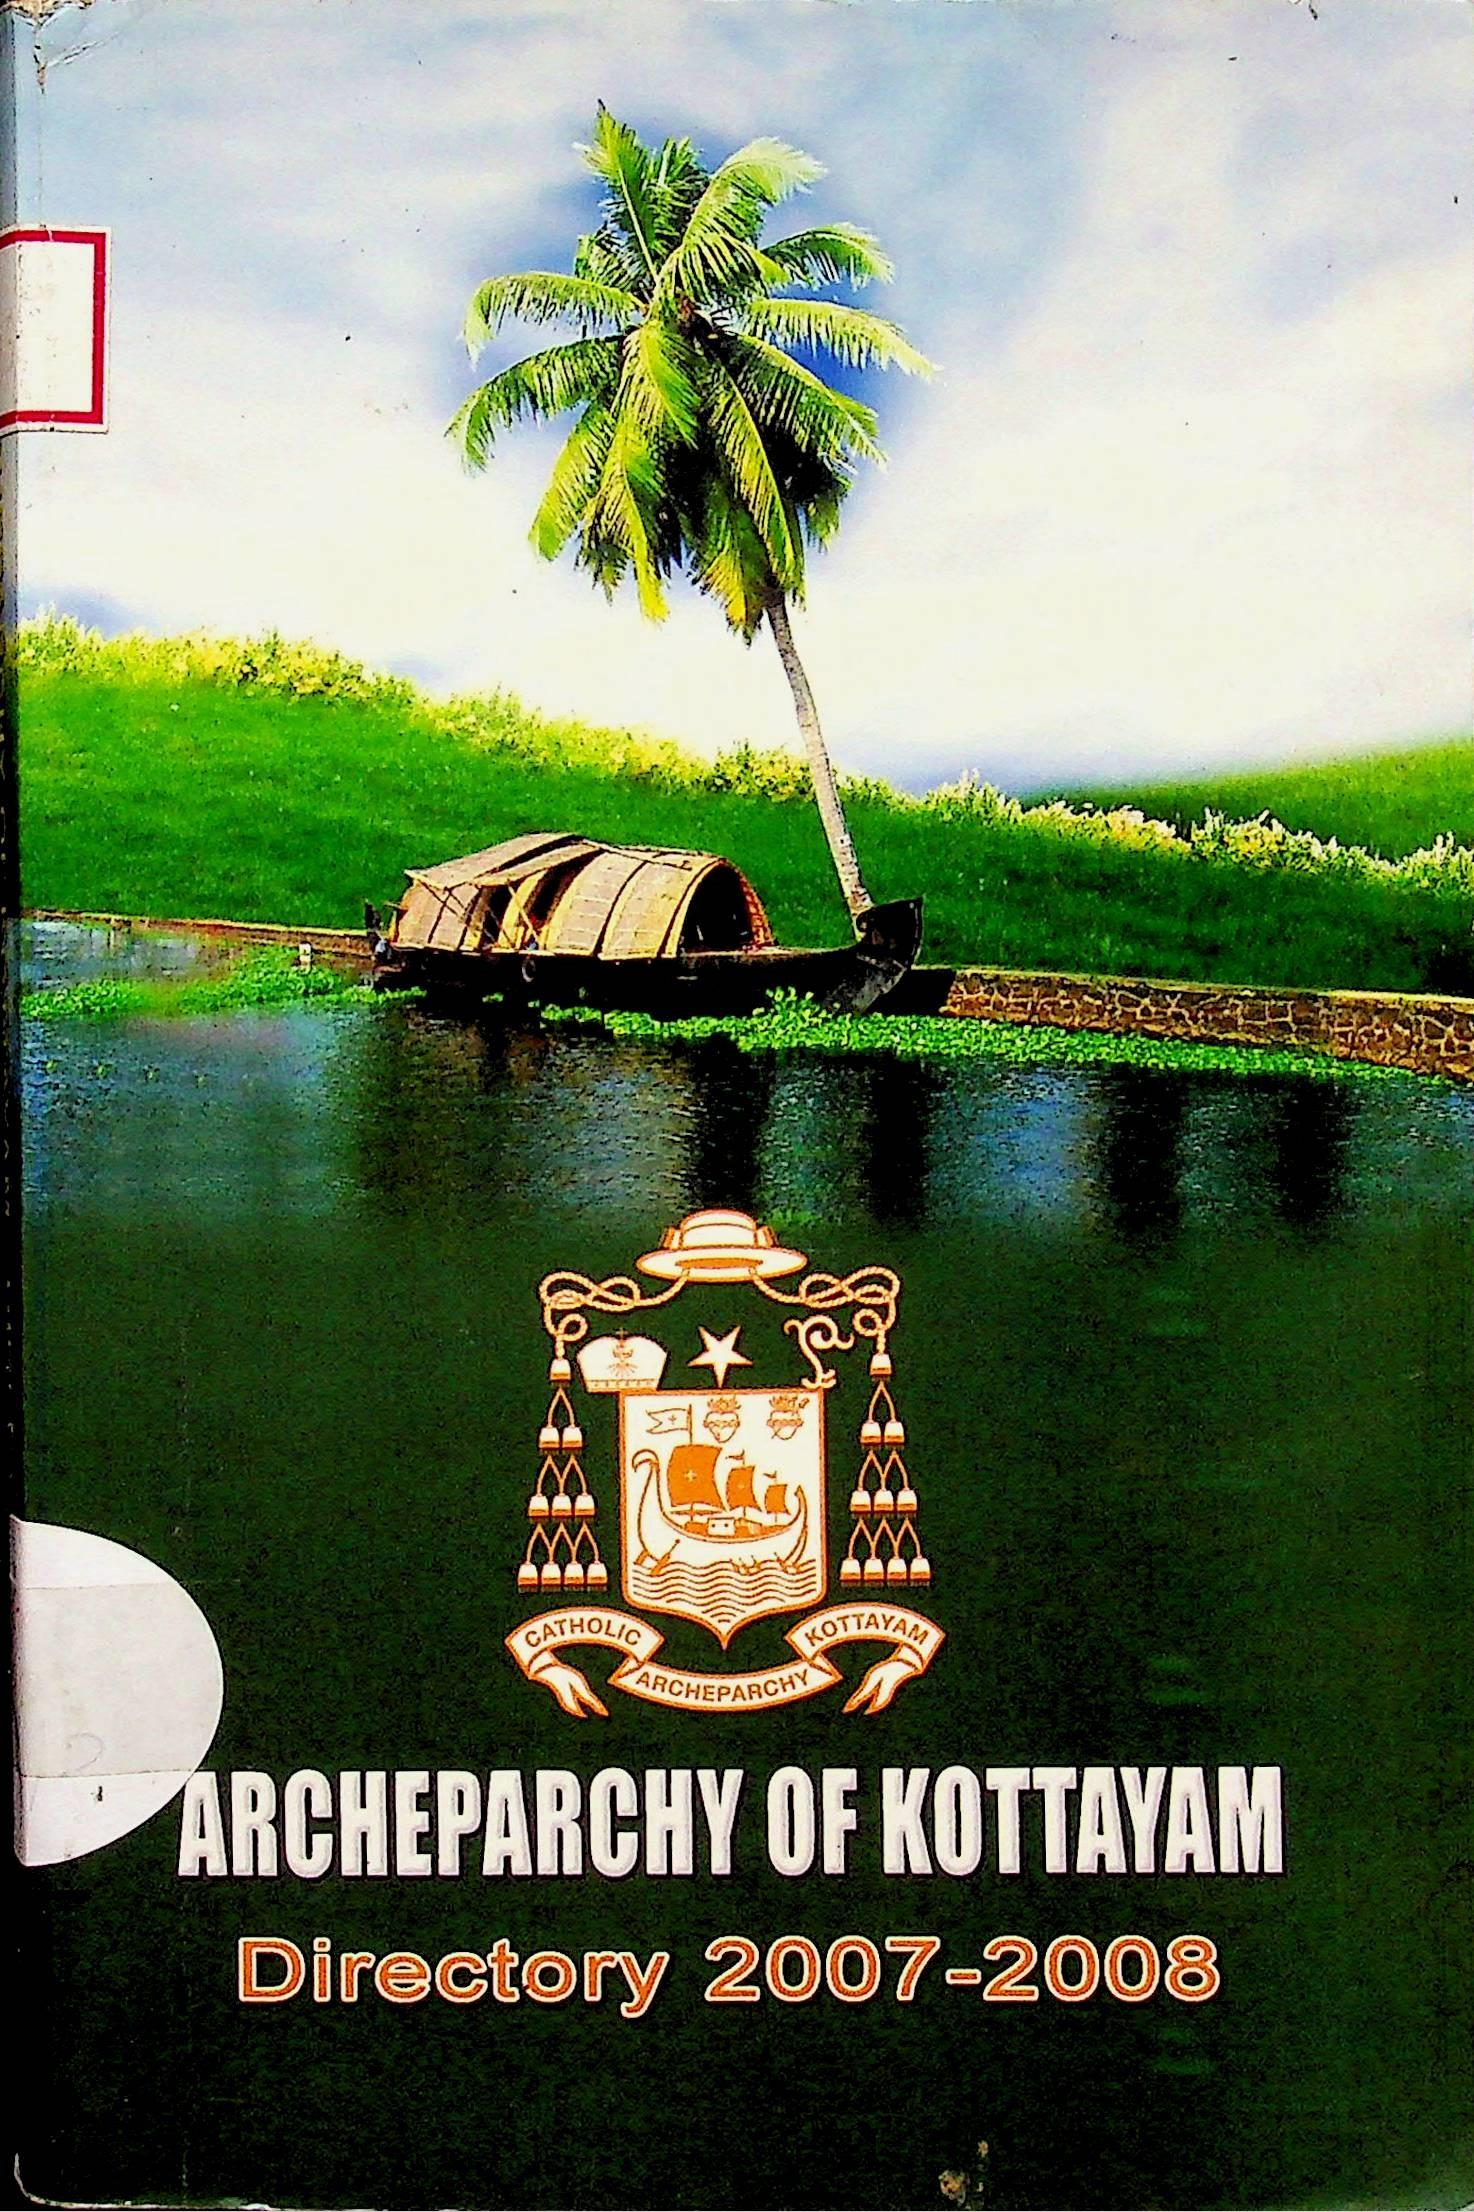 Directory 2007-2008